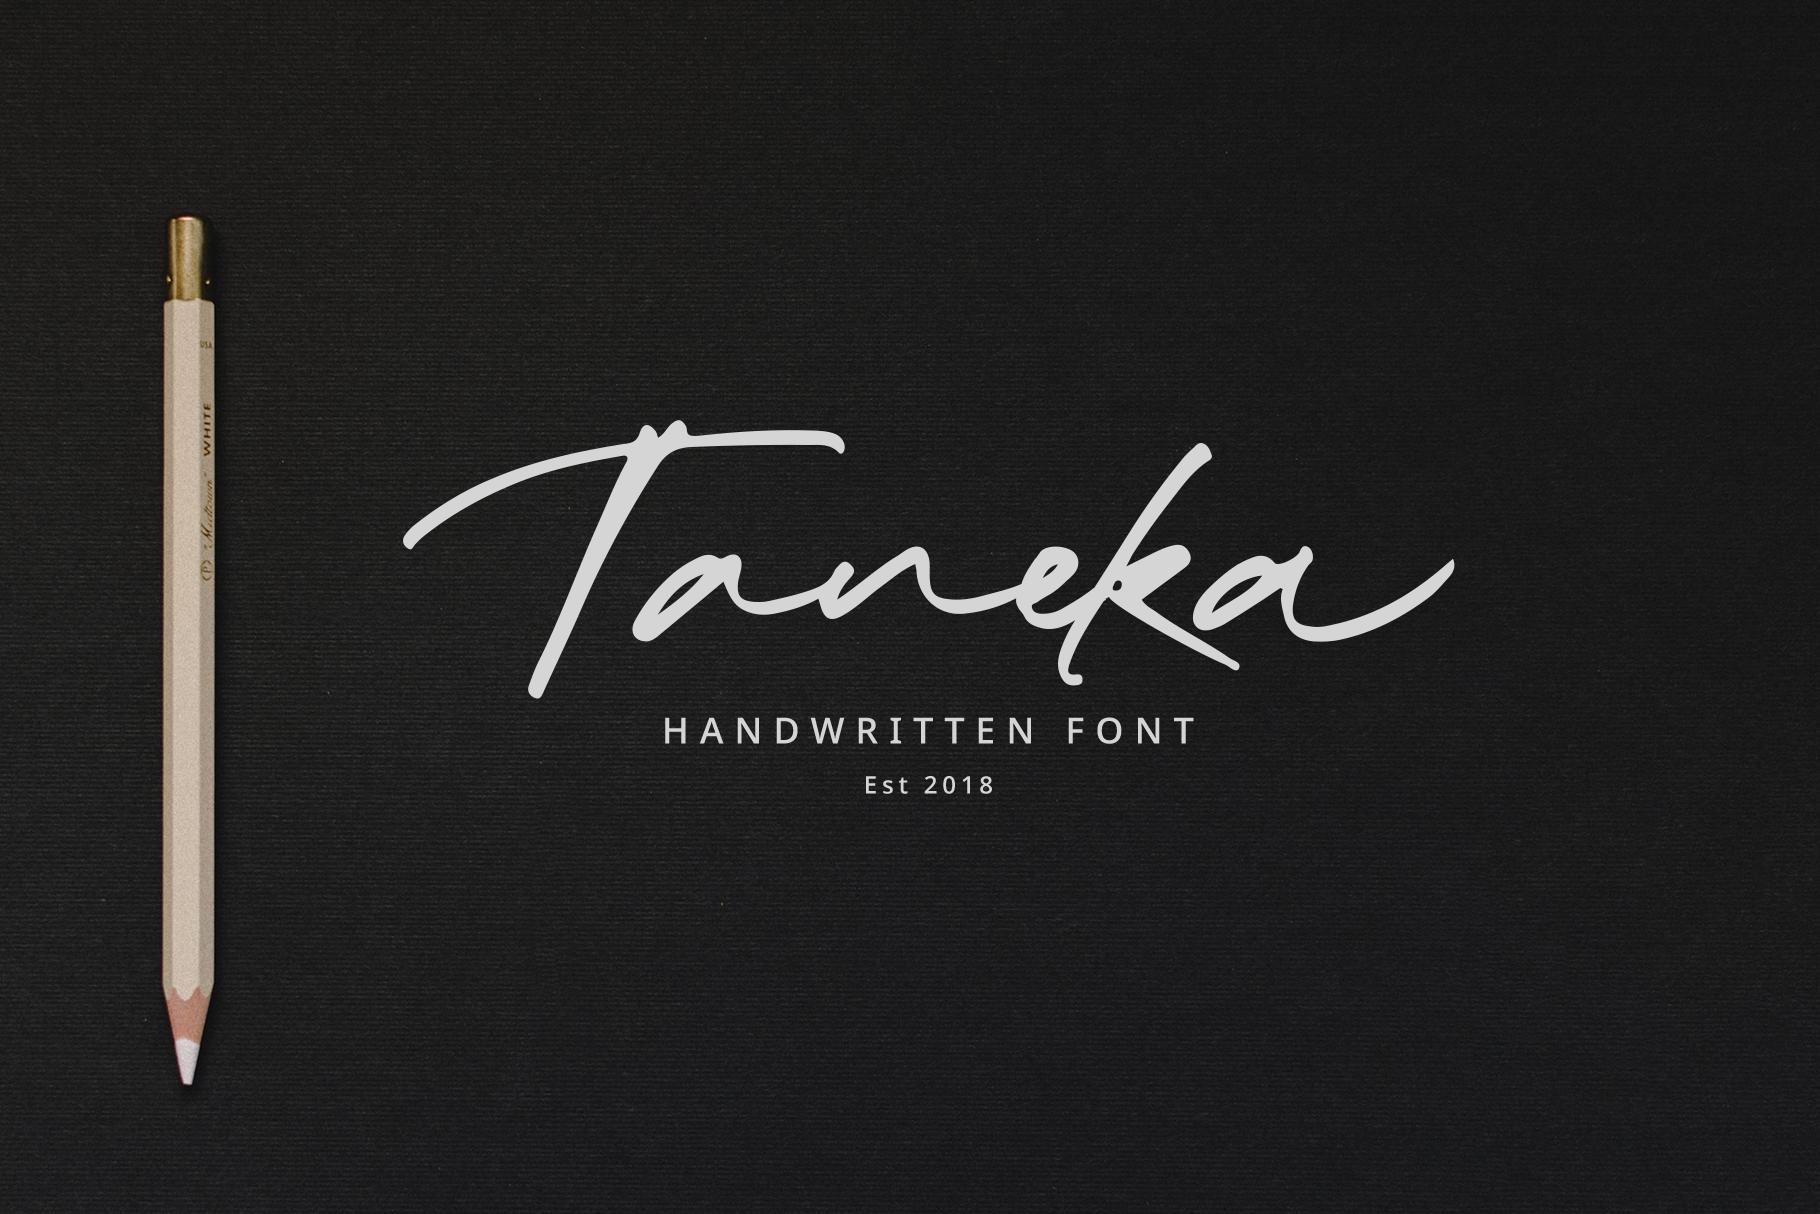 Taneka Handwritten example image 1